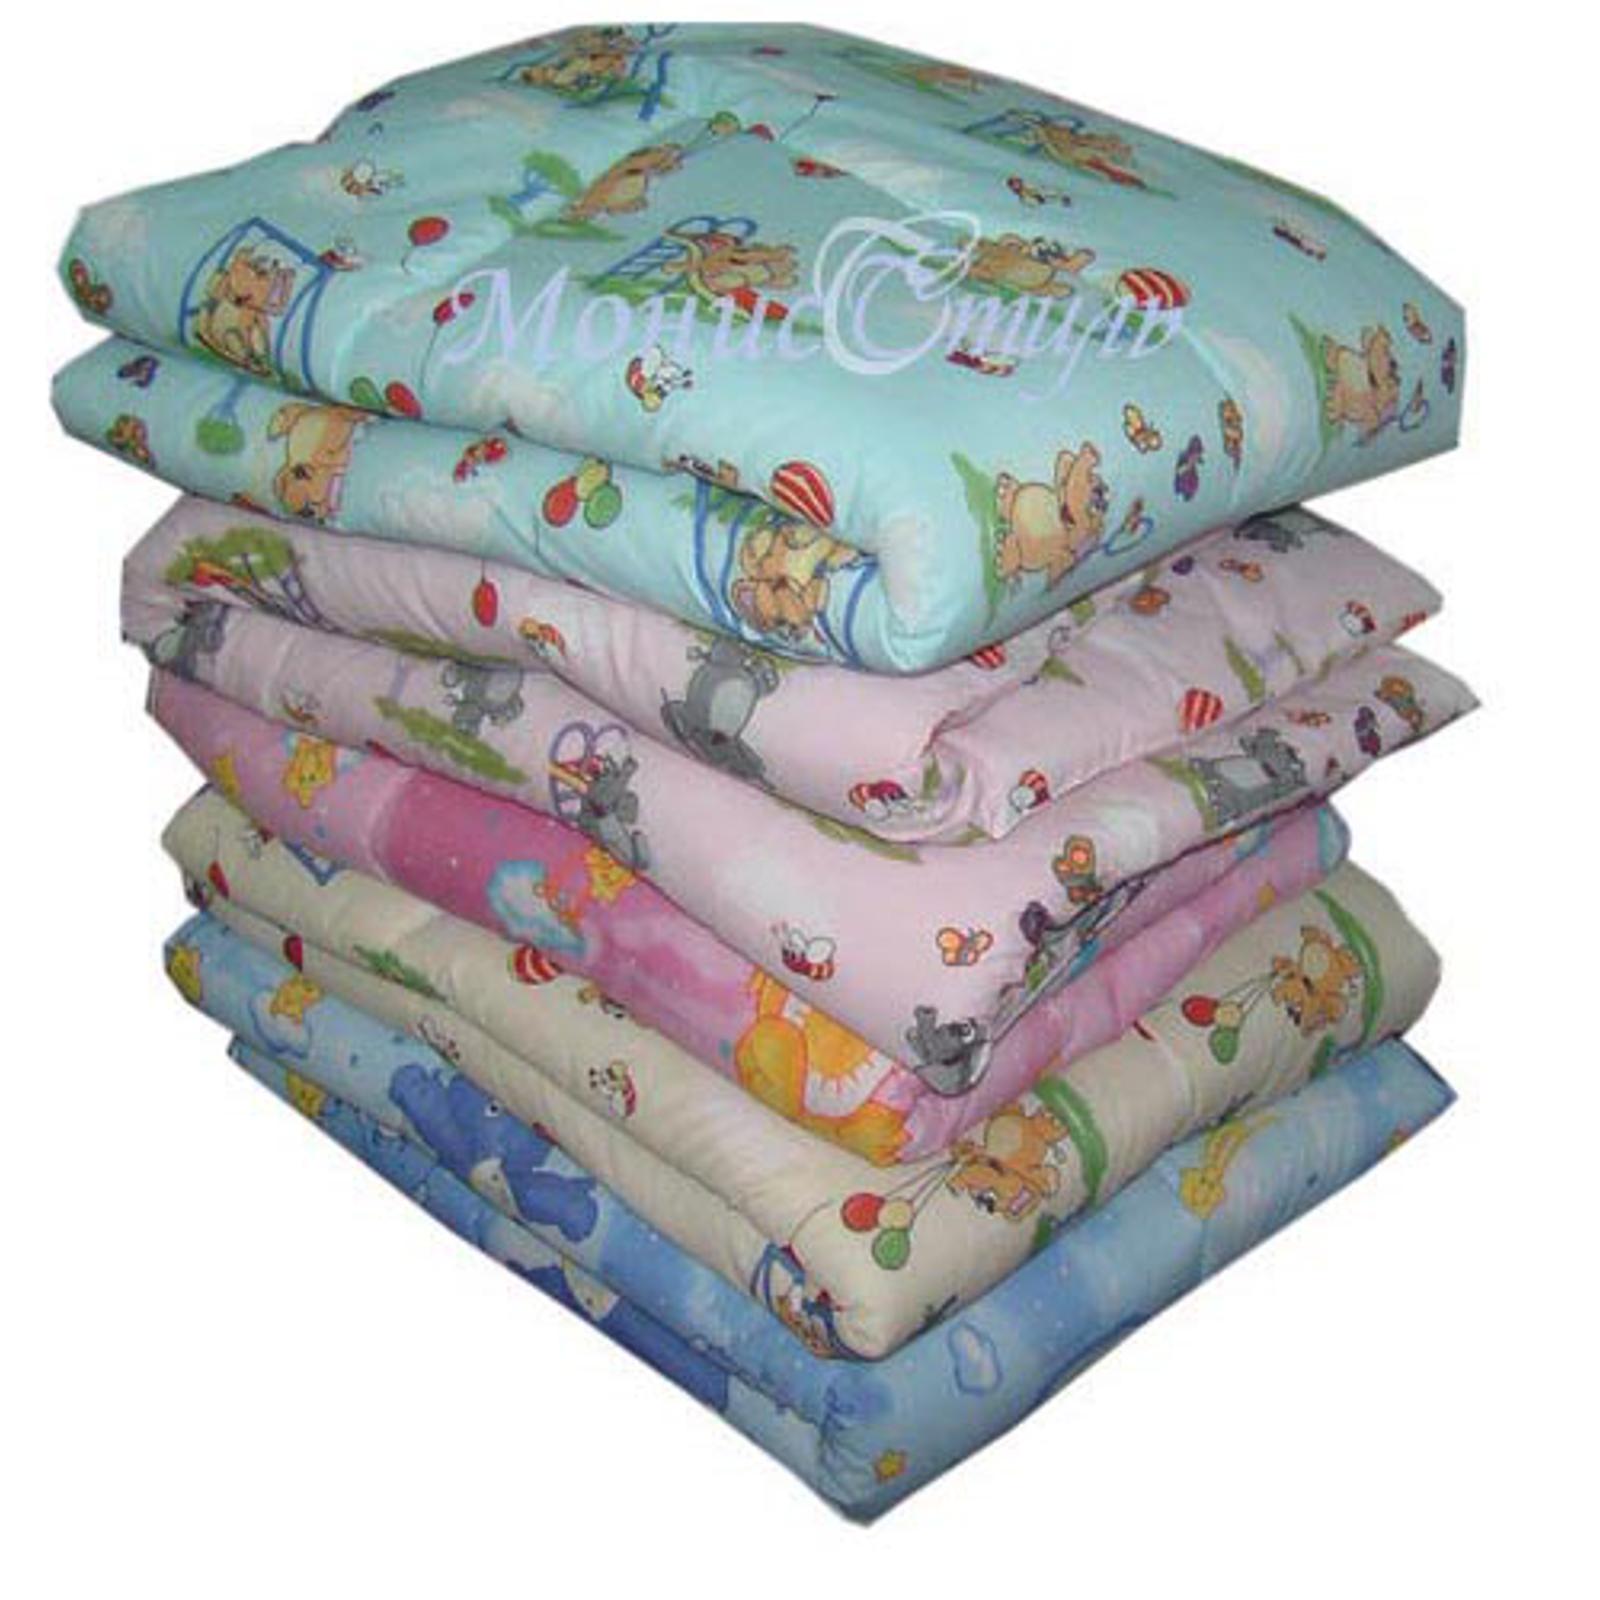 Комплект Монис стиль одеяло 110х140 и подушка 40х60 Холлофайбер Бязь К-10